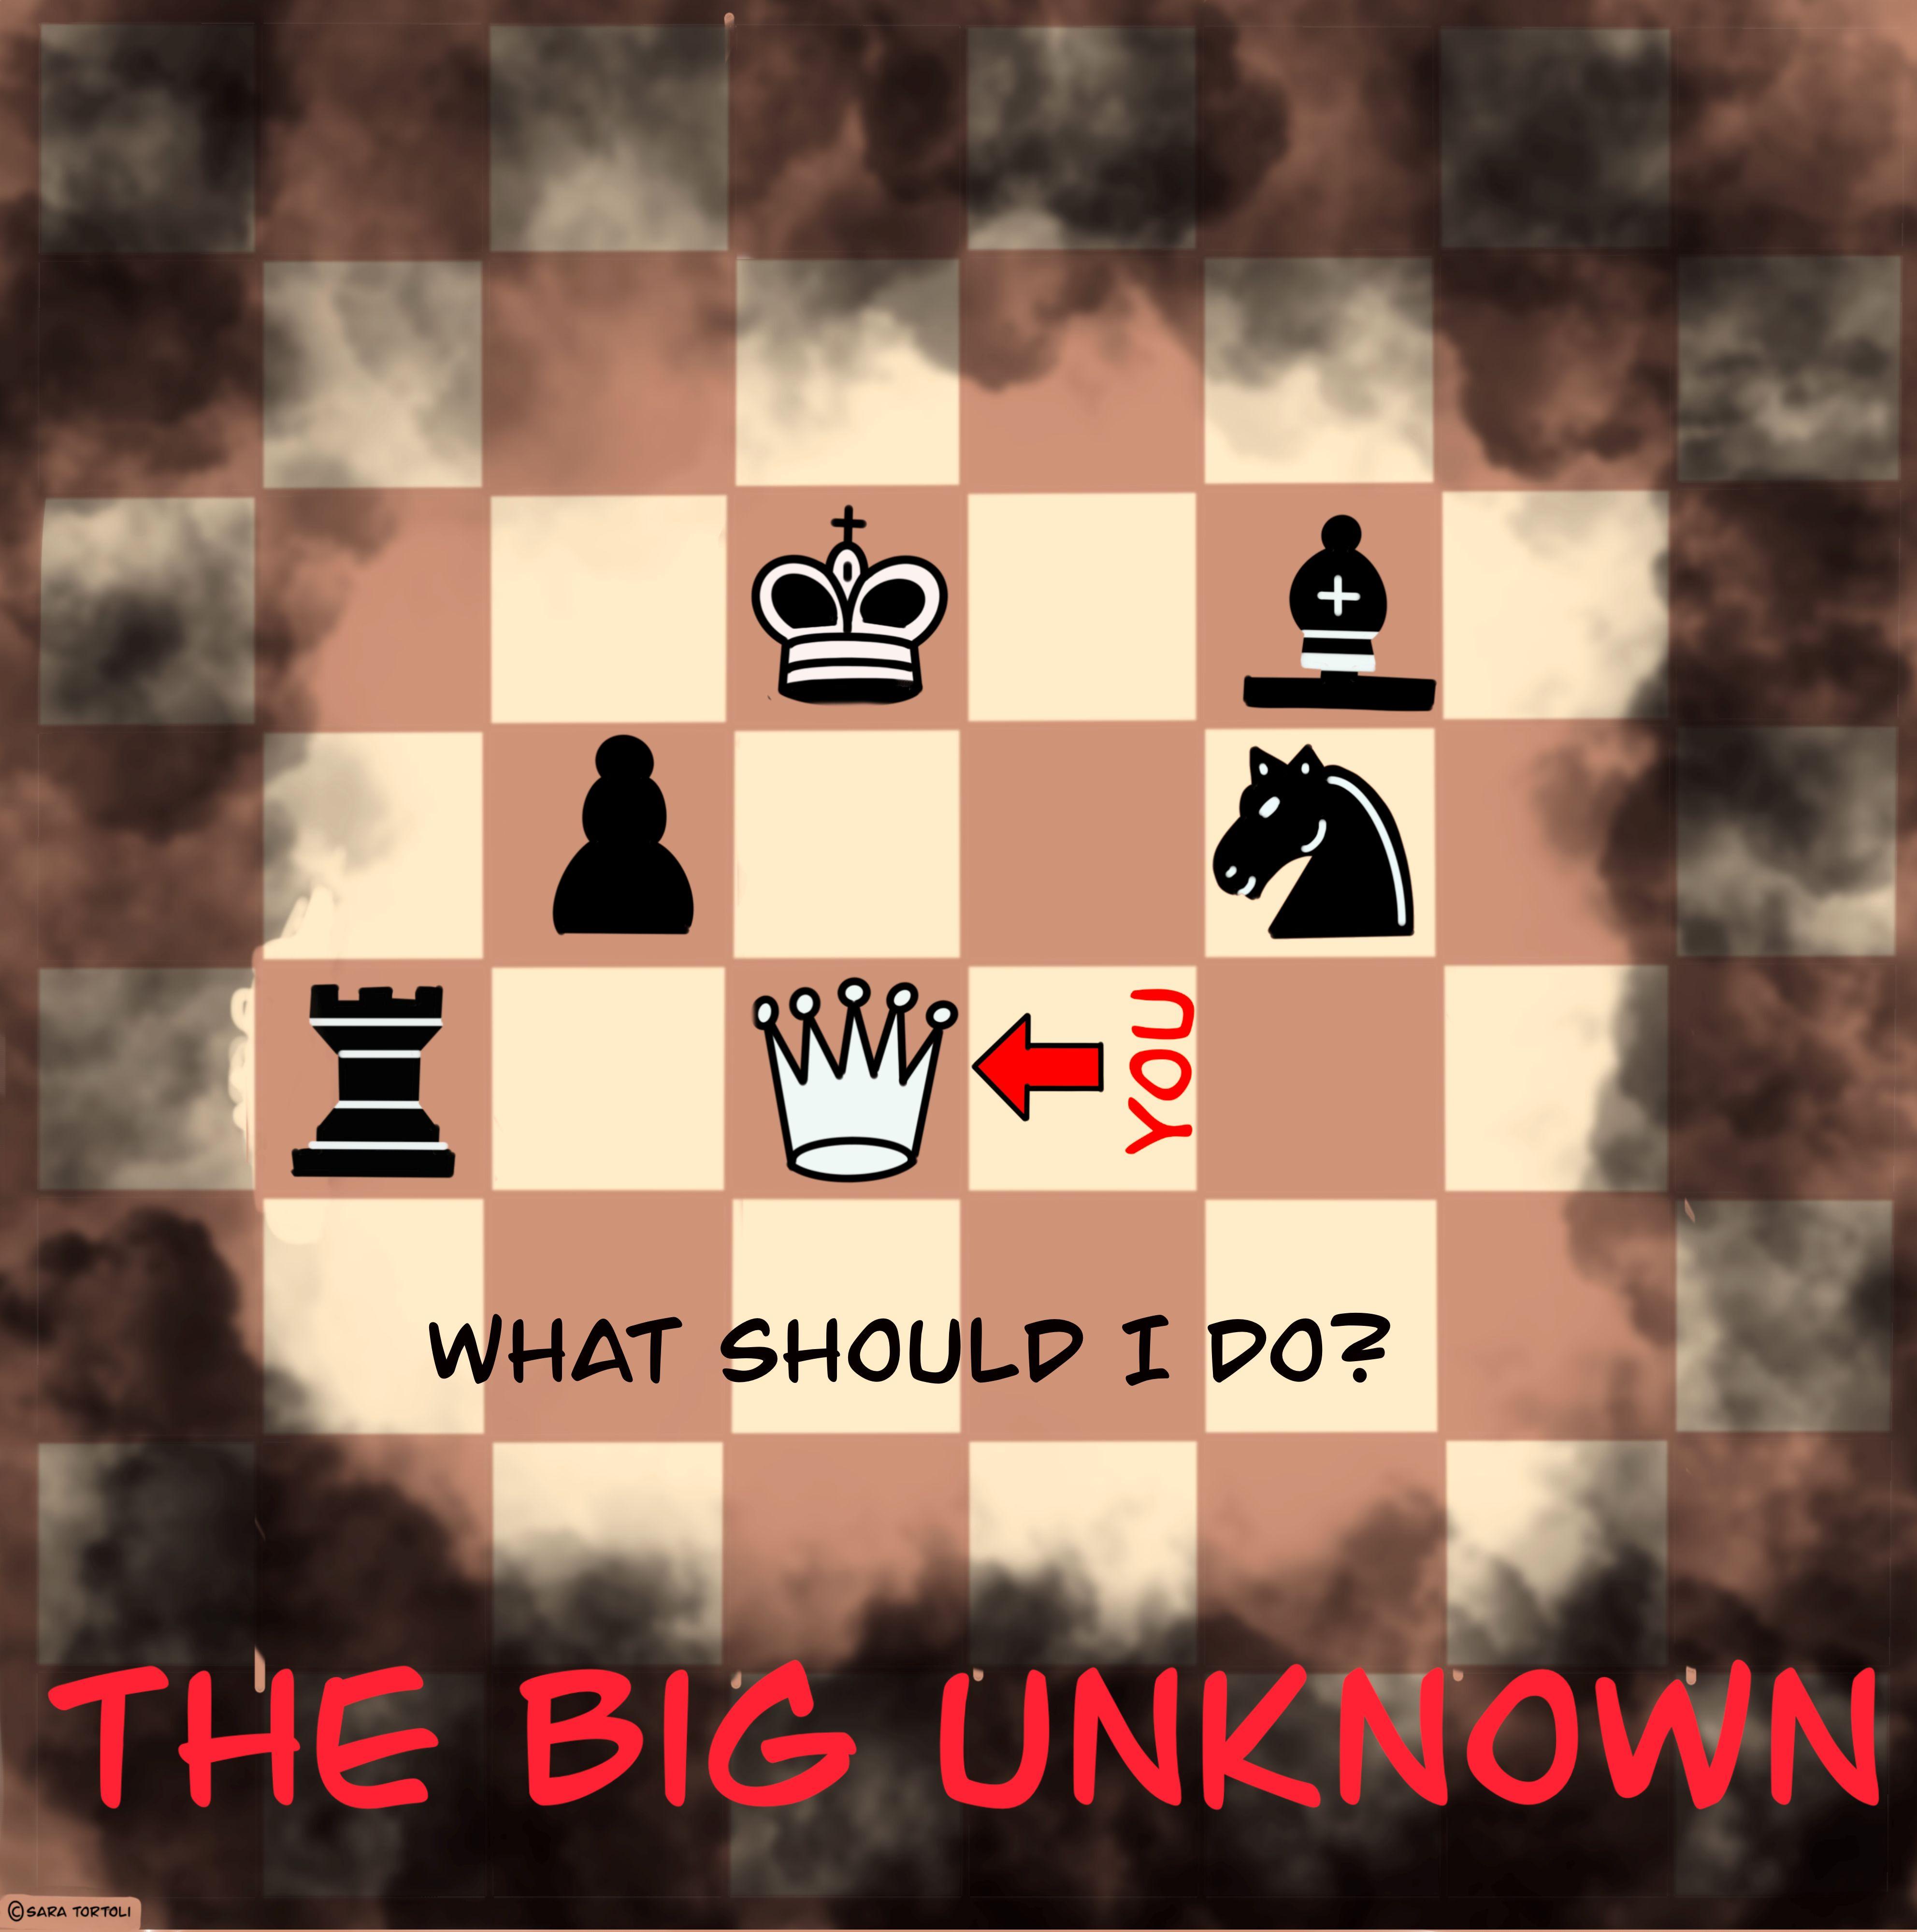 /the-blind-game-a-decision-making-framework-kgu3eo9 feature image